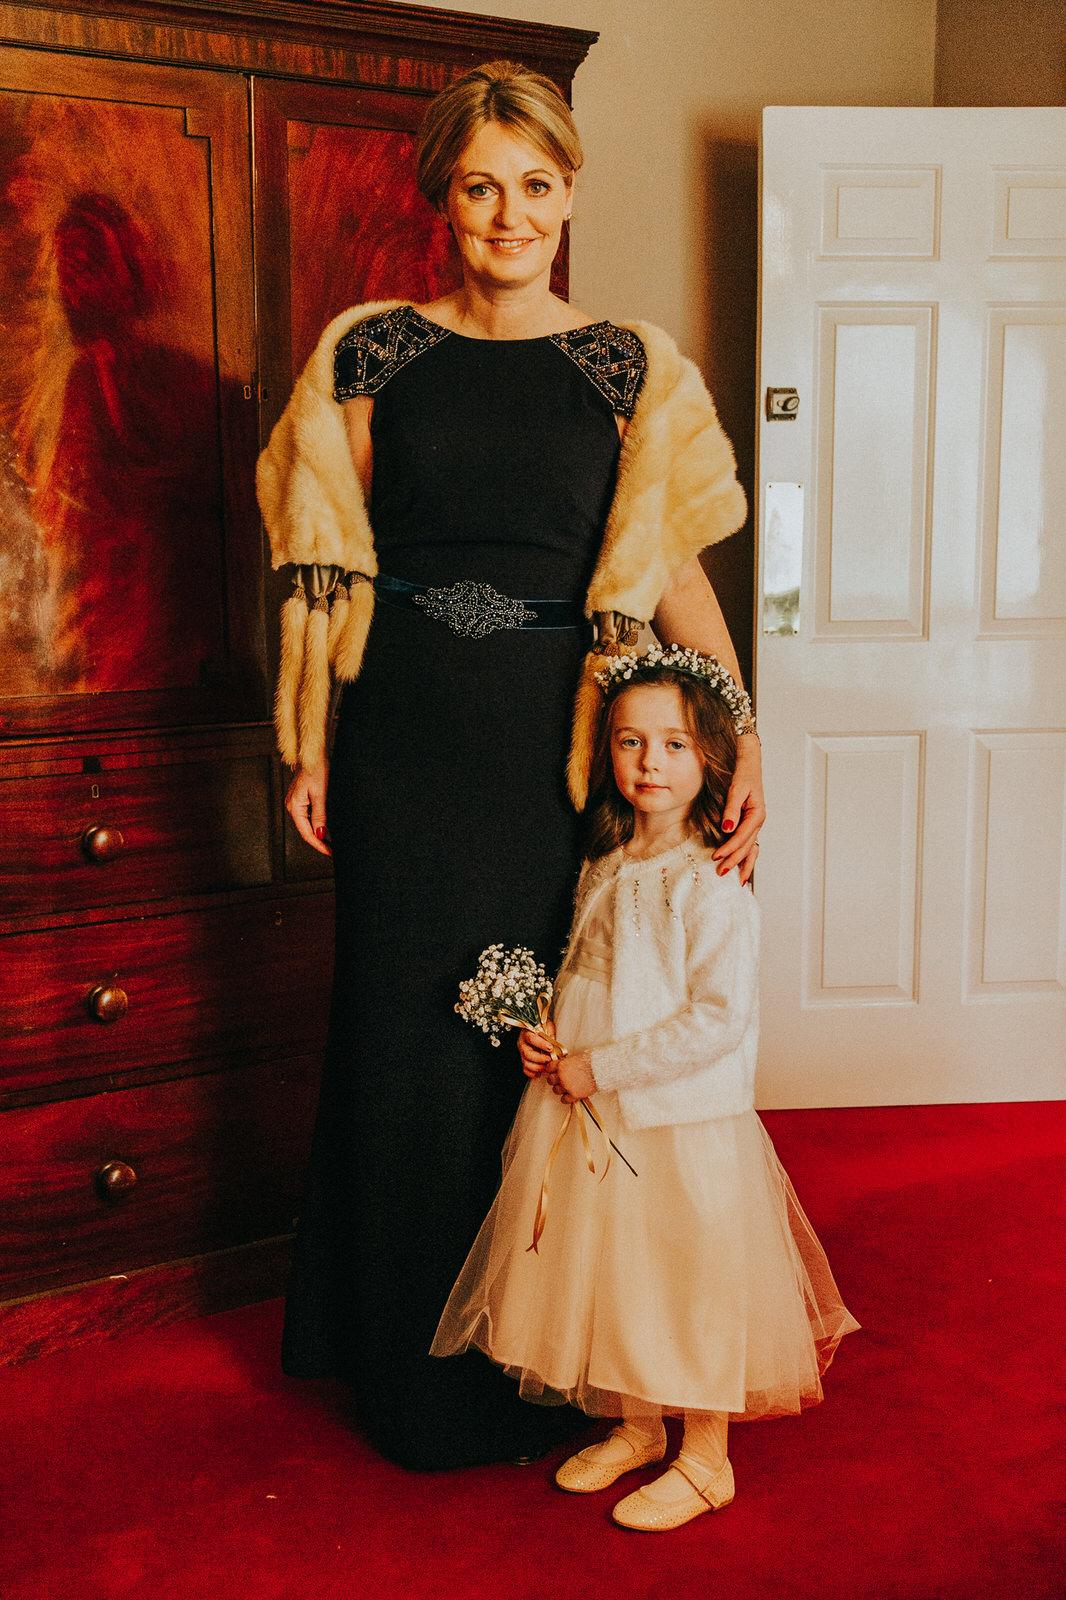 Dunbrody_House_Wedding_photographer_051.jpg